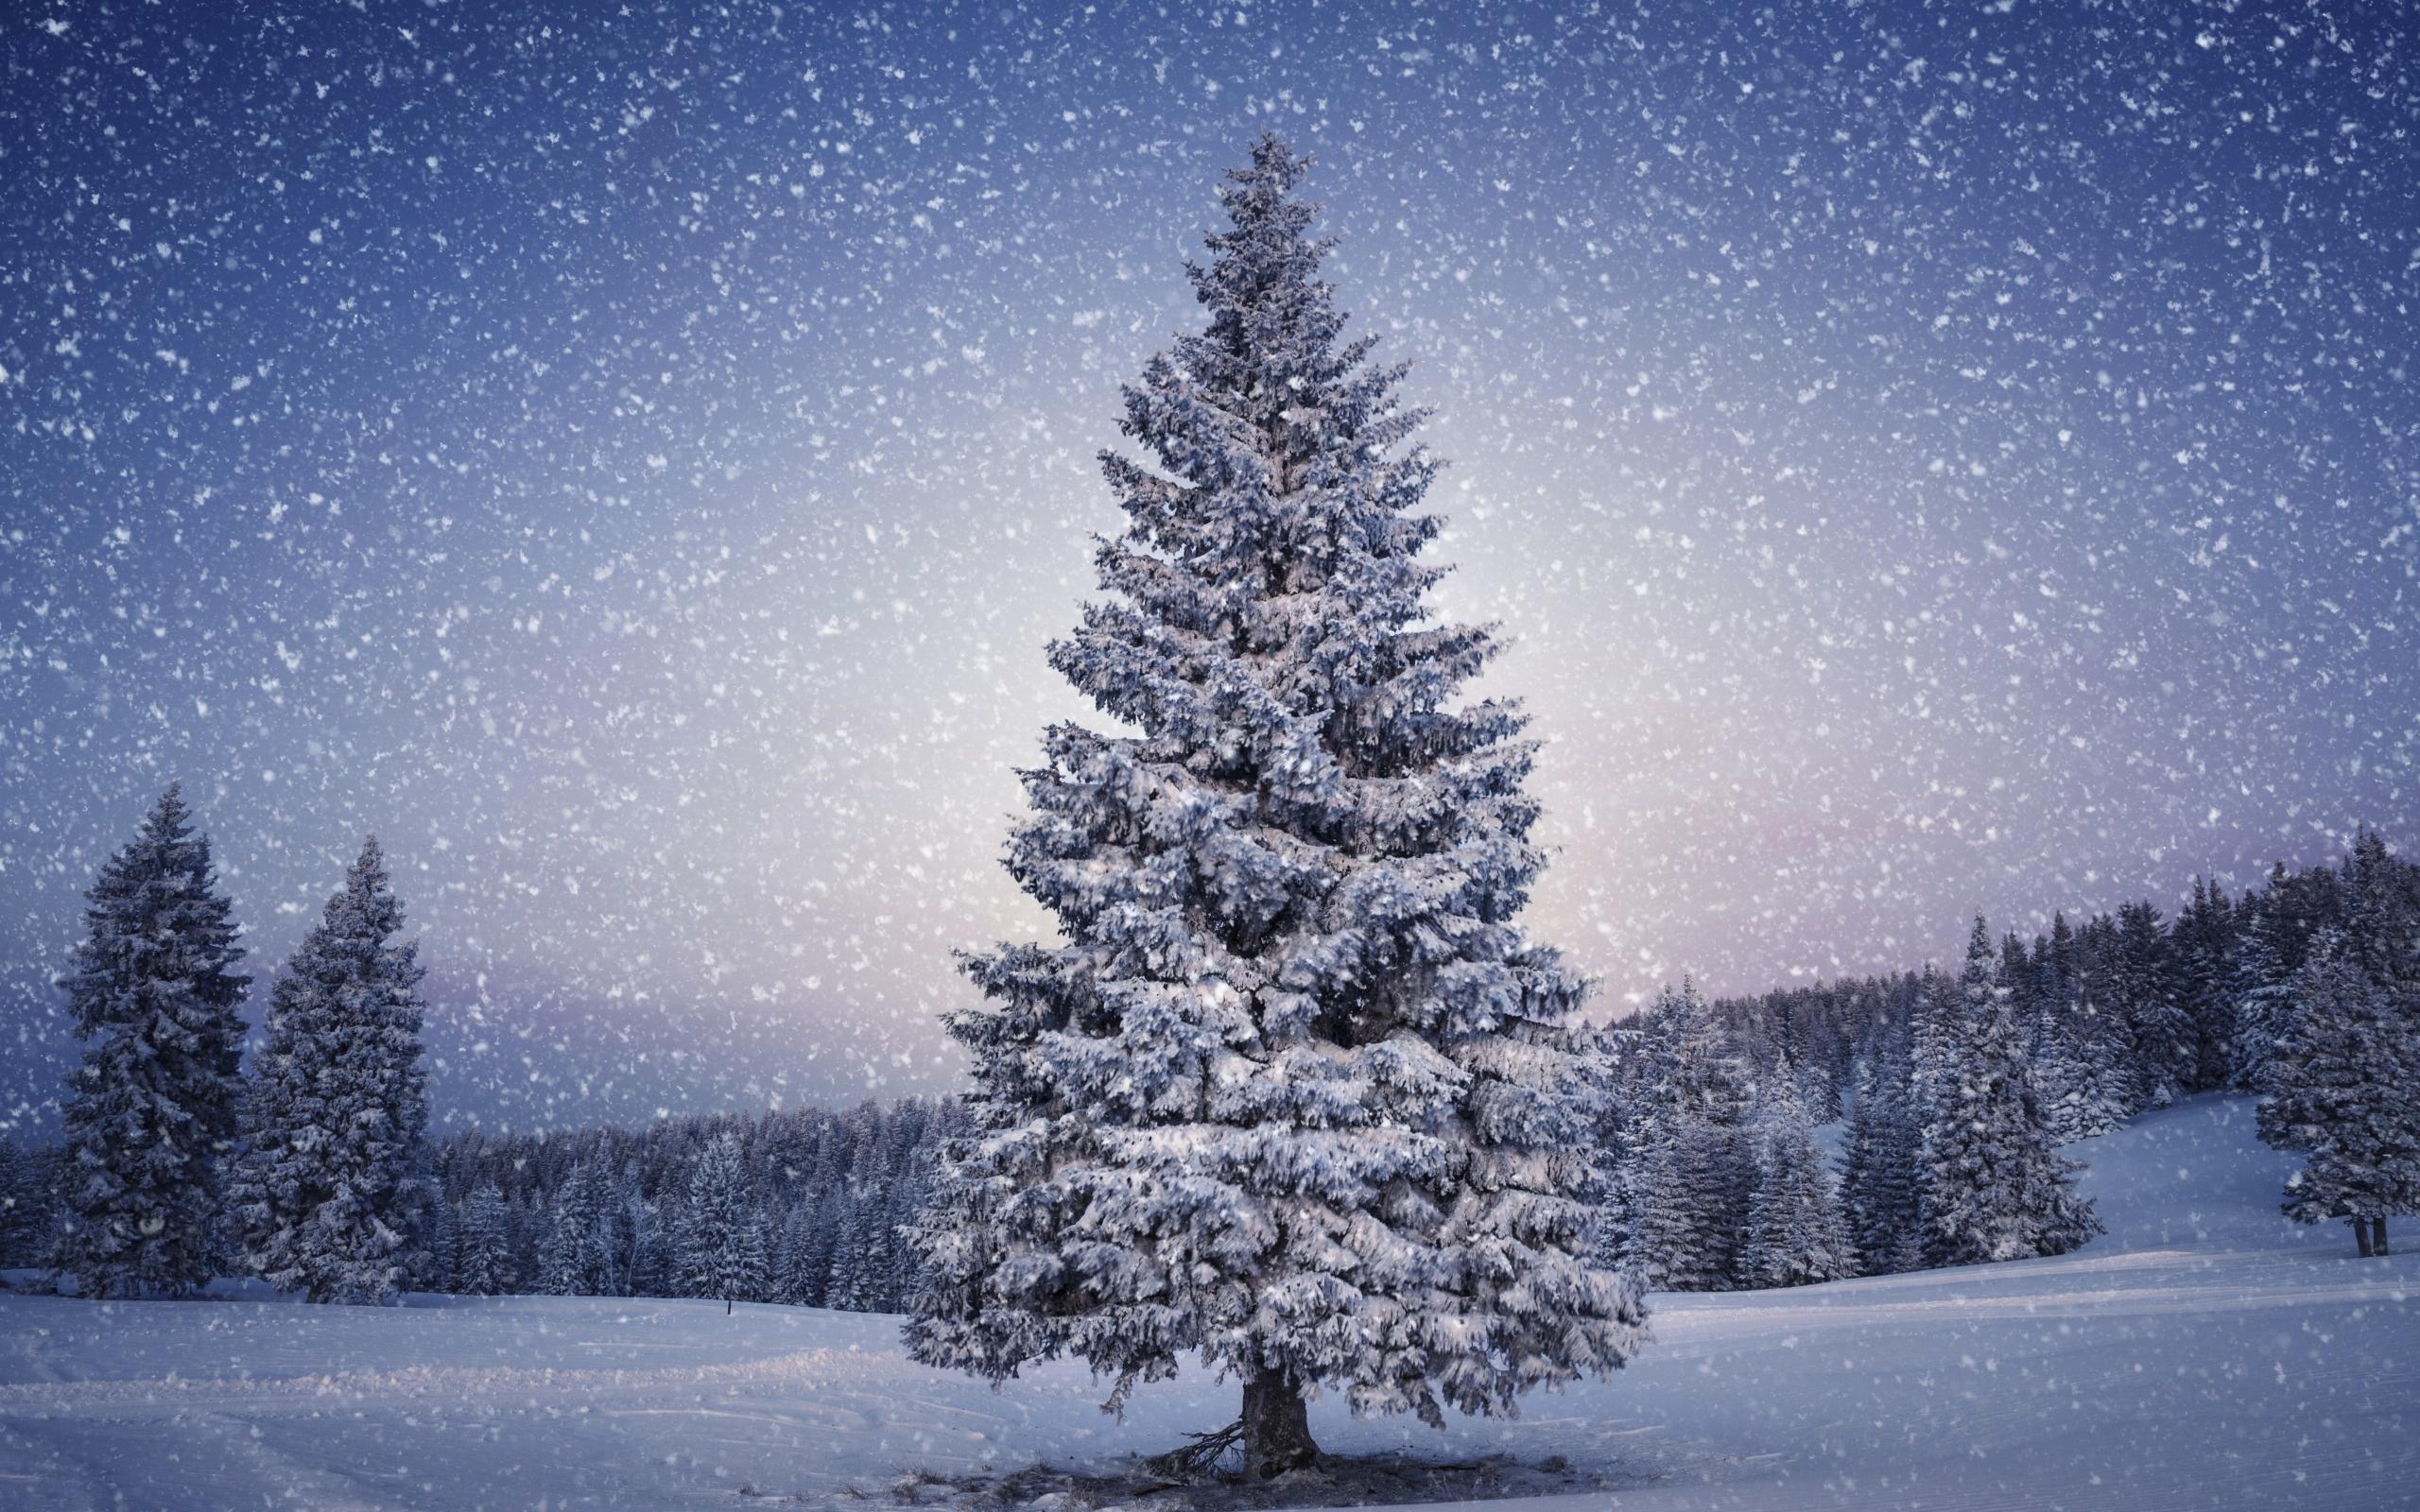 Snowing Christmas Scene.73 Snowy Christmas Wallpaper On Wallpapersafari